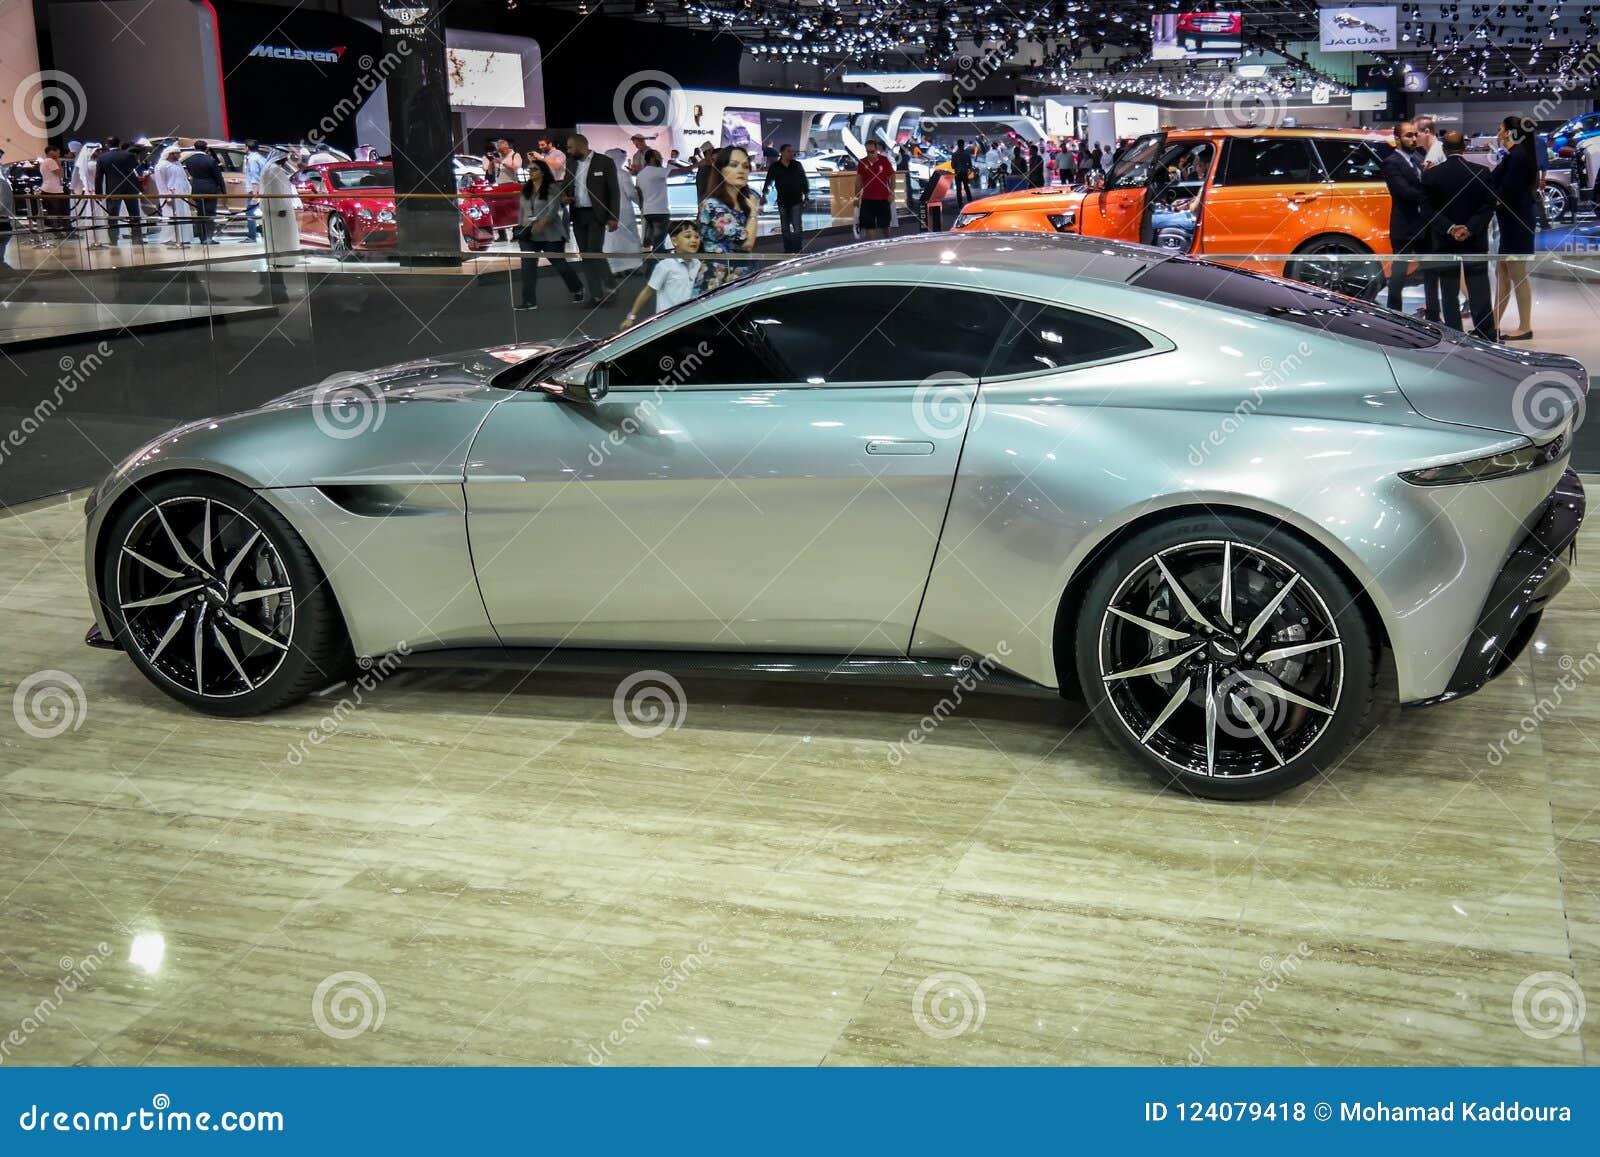 Dubai Motor Aston Martin Corner Displaying Their New Cars Editorial Stock Photo Image Of Design Motor 124079418